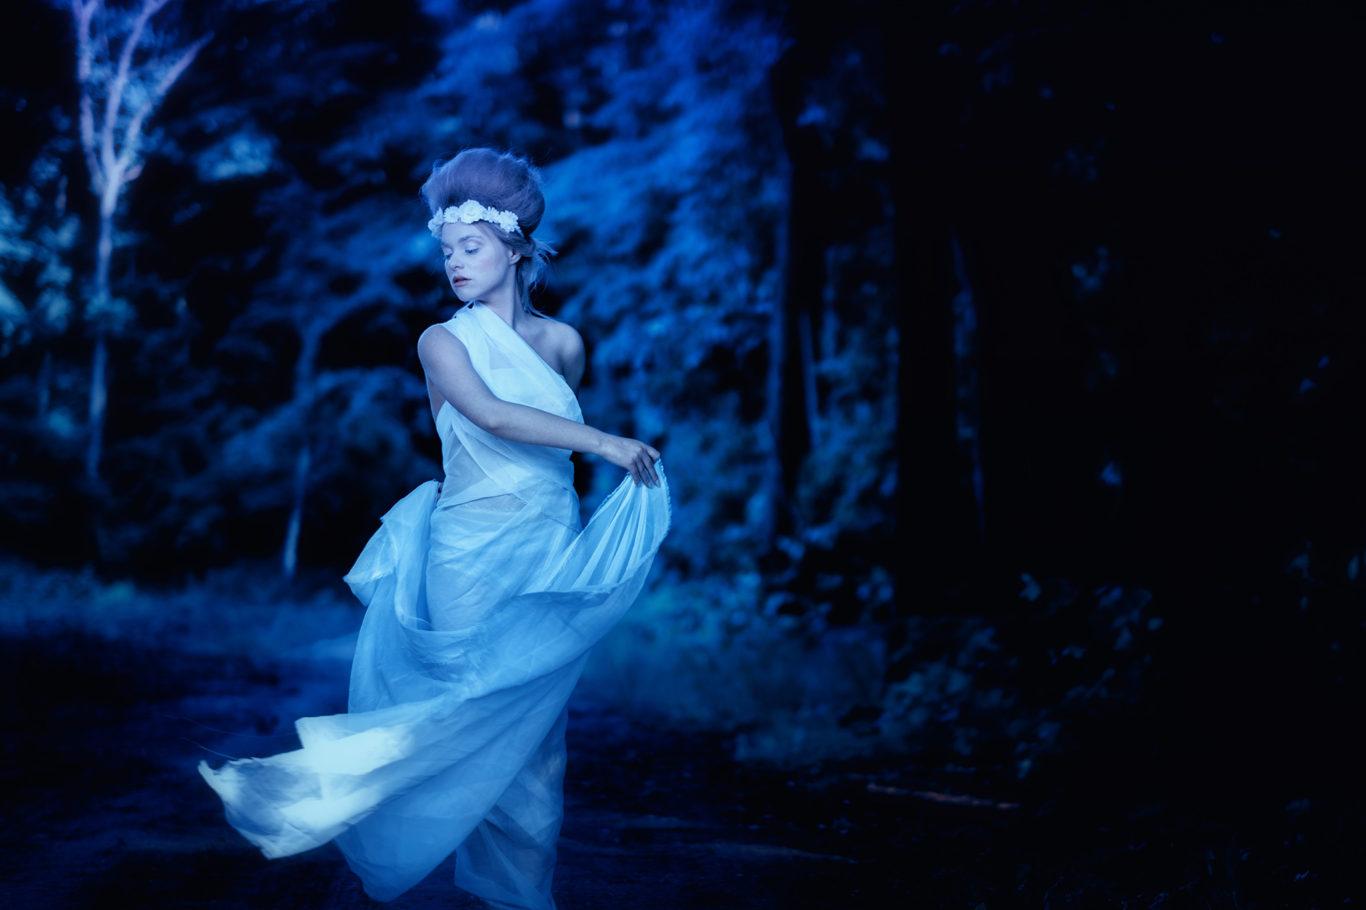 0080-Fotografie-fashion-Frozen-Queen-fotograf-Ciprian-Dumitrescu-DSCF7293